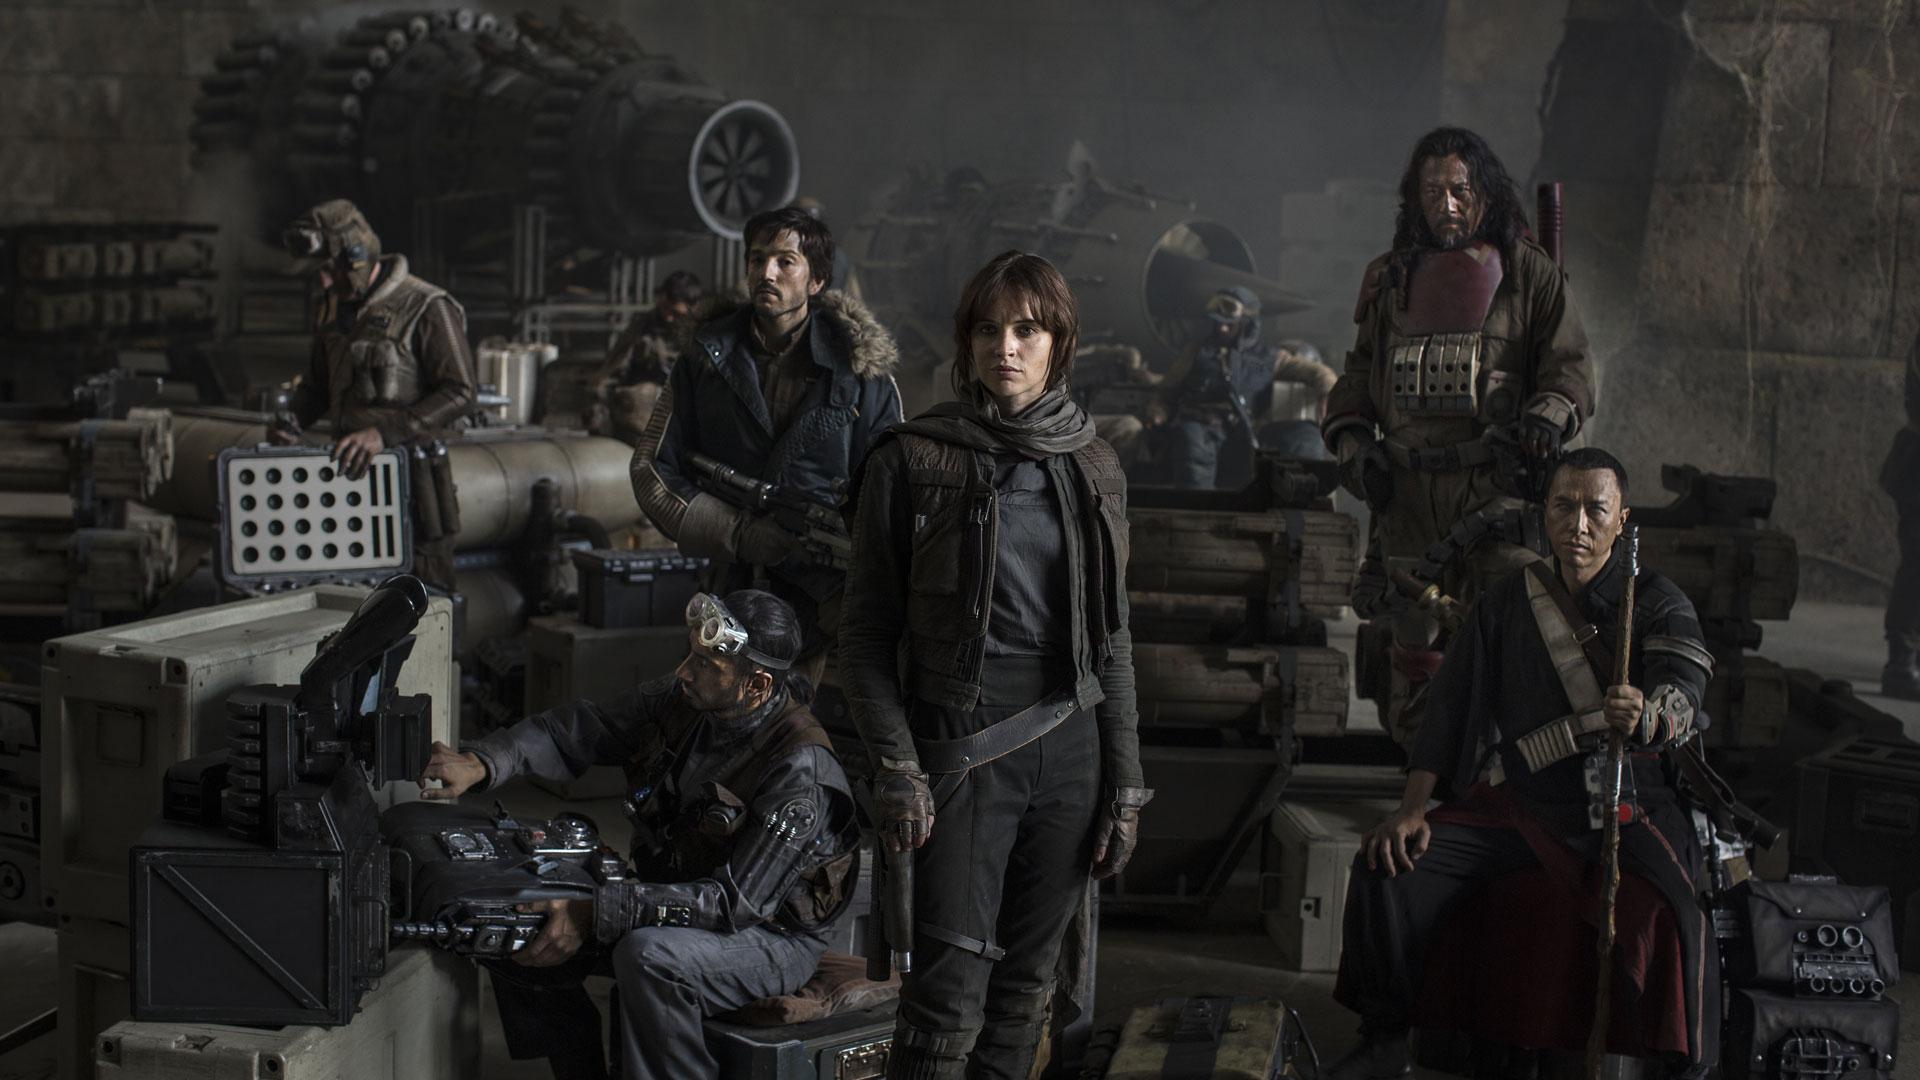 Skuespillerne Riz Ahmed, Diego Luna, Felicity Jones og Jiang Wen i Rogue One: A Star Wars Story (Foto: The Walt Disney Company Nordic, Lucasfilm Ltd.)